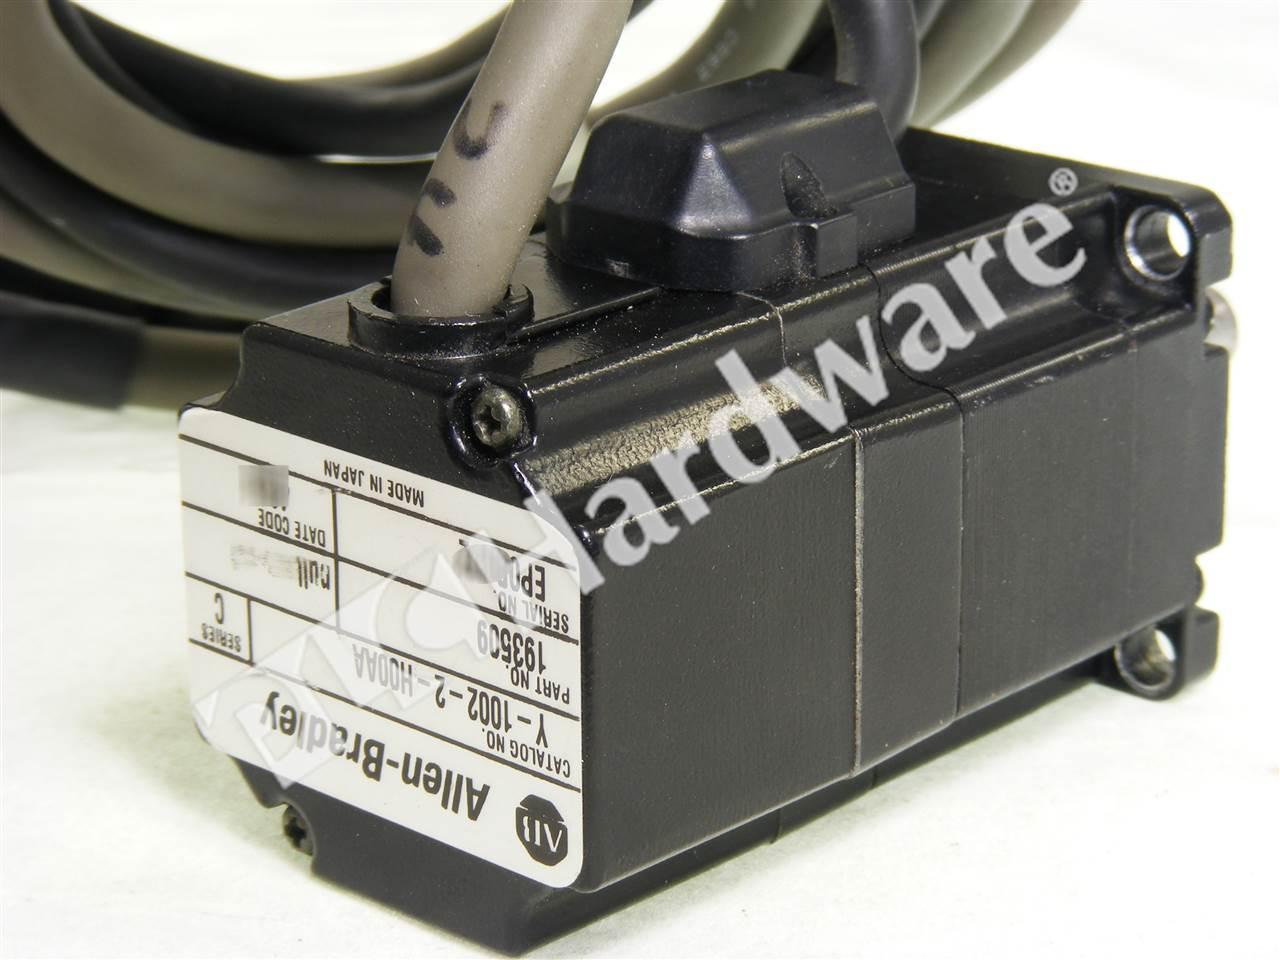 Siemens Iec Motor Catalog Find Siemens 3rt1034 1ap60